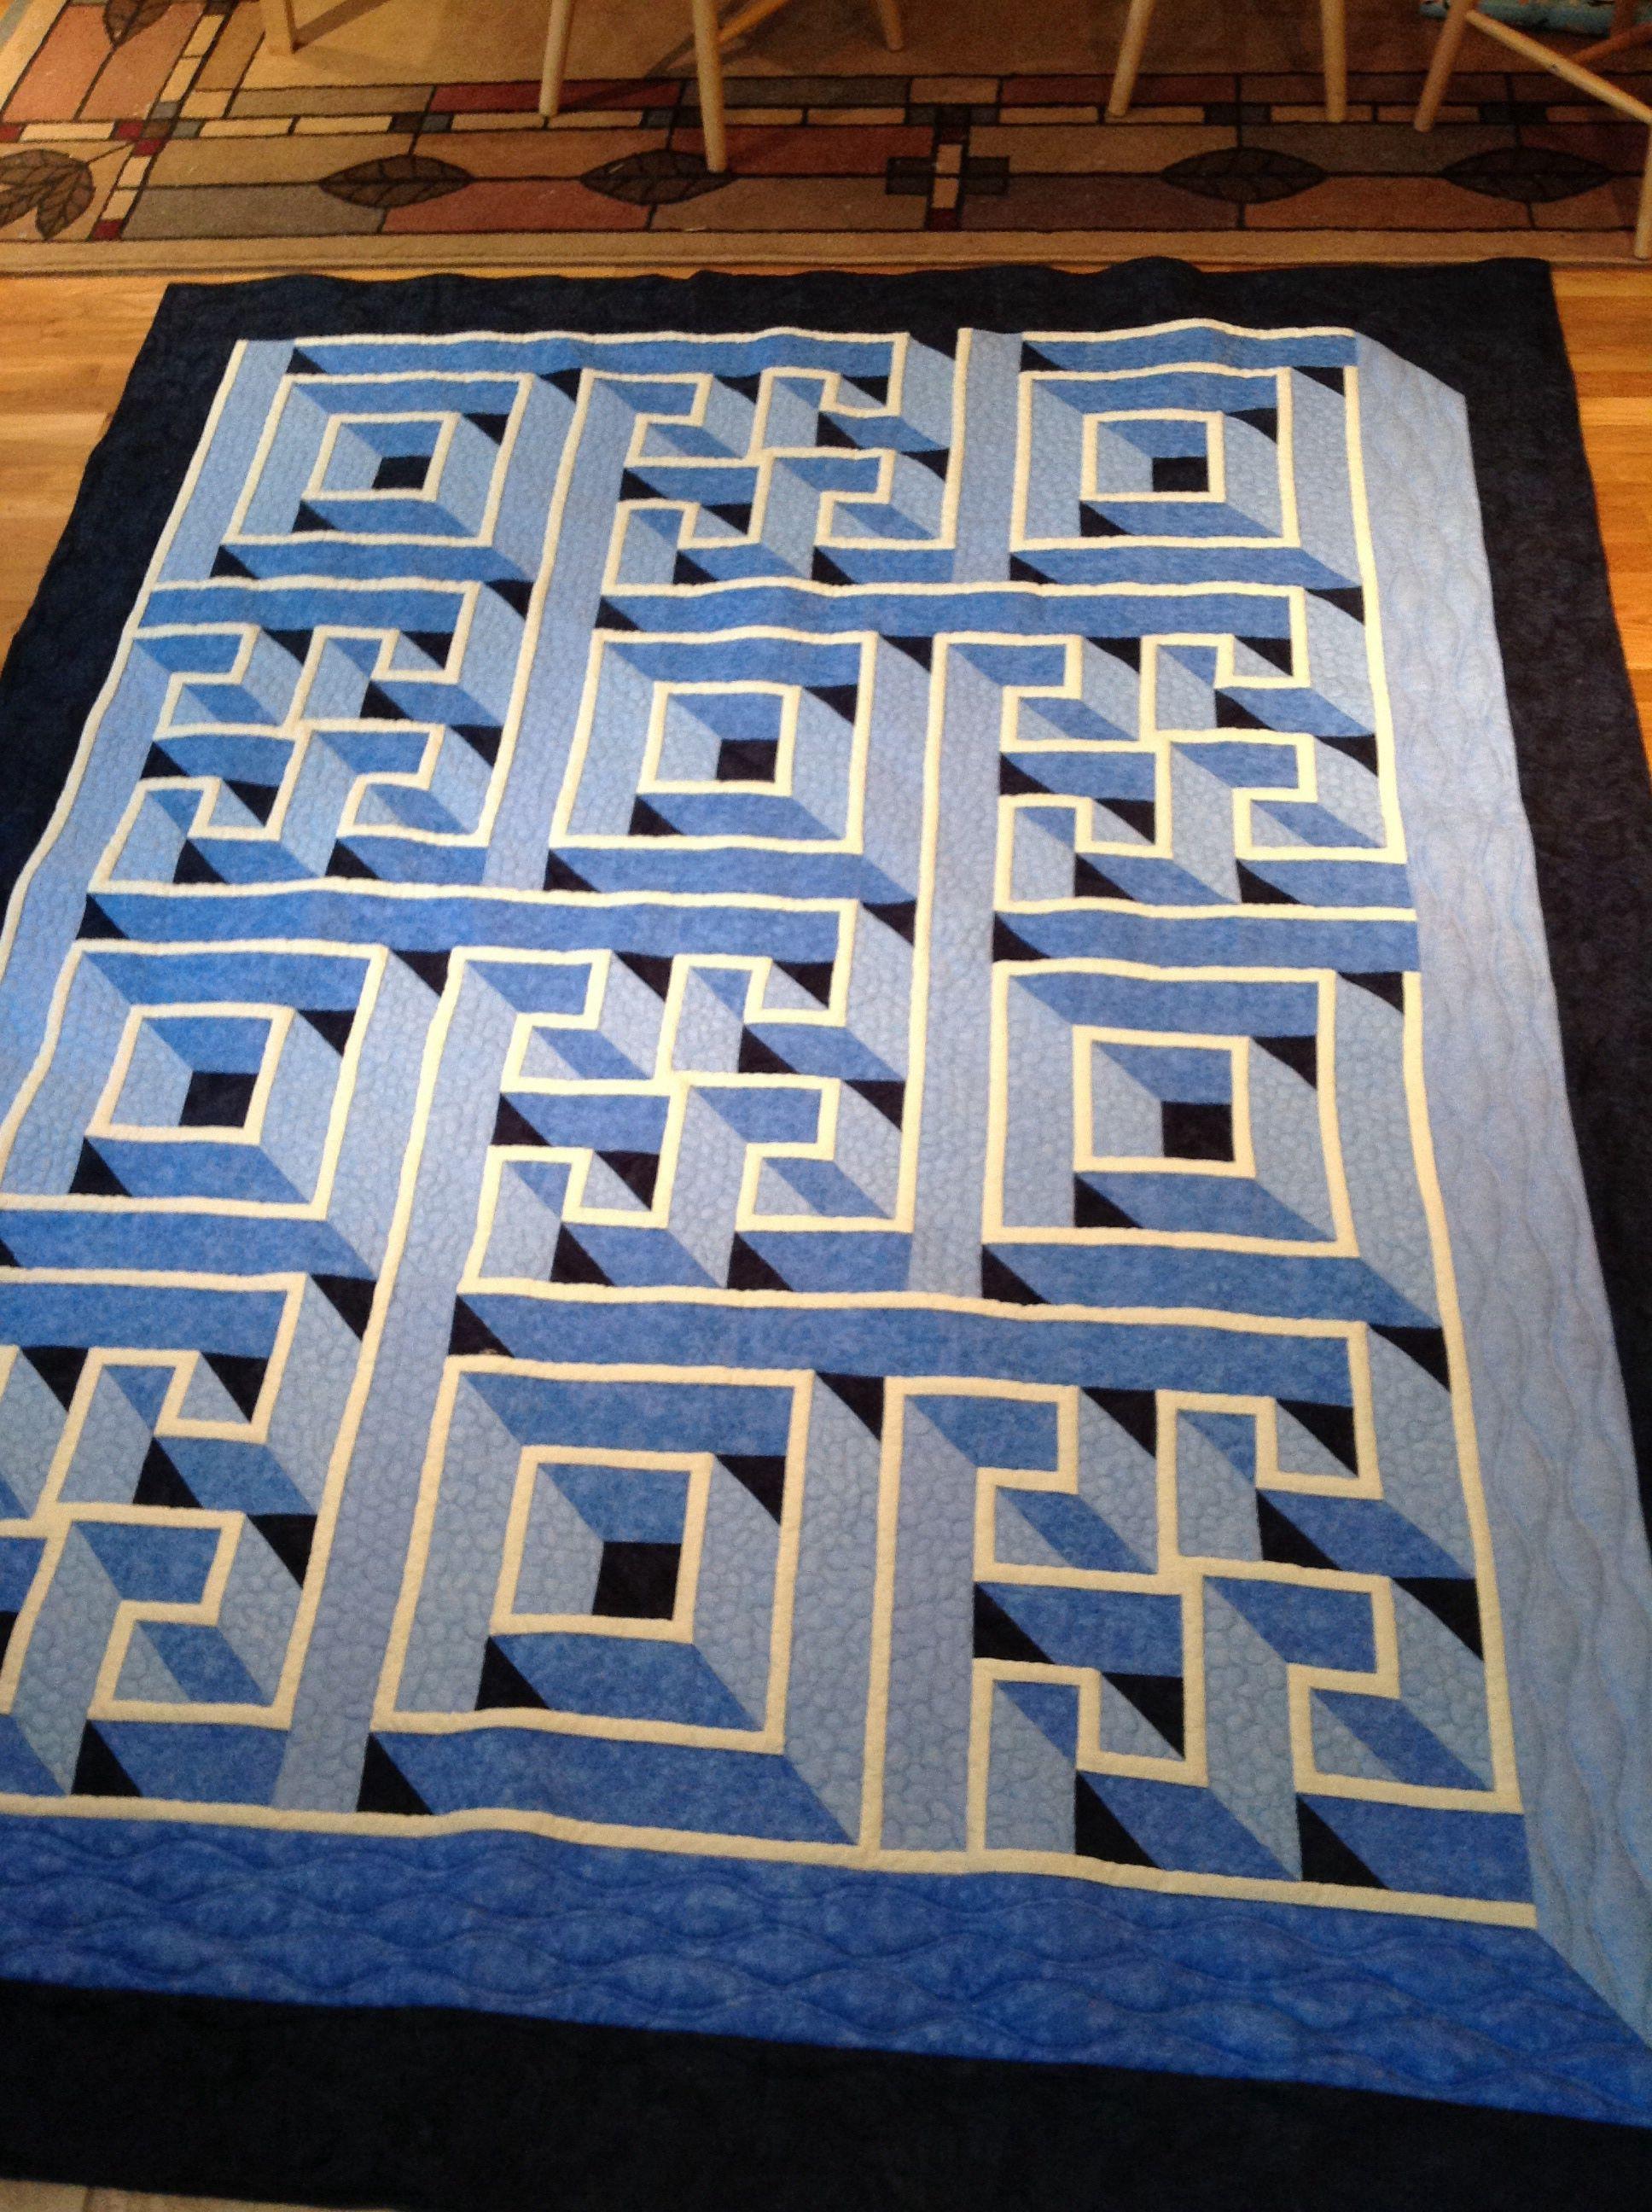 Walking Labyrinth Quilt An Amazing Quilt Quilt Quilts